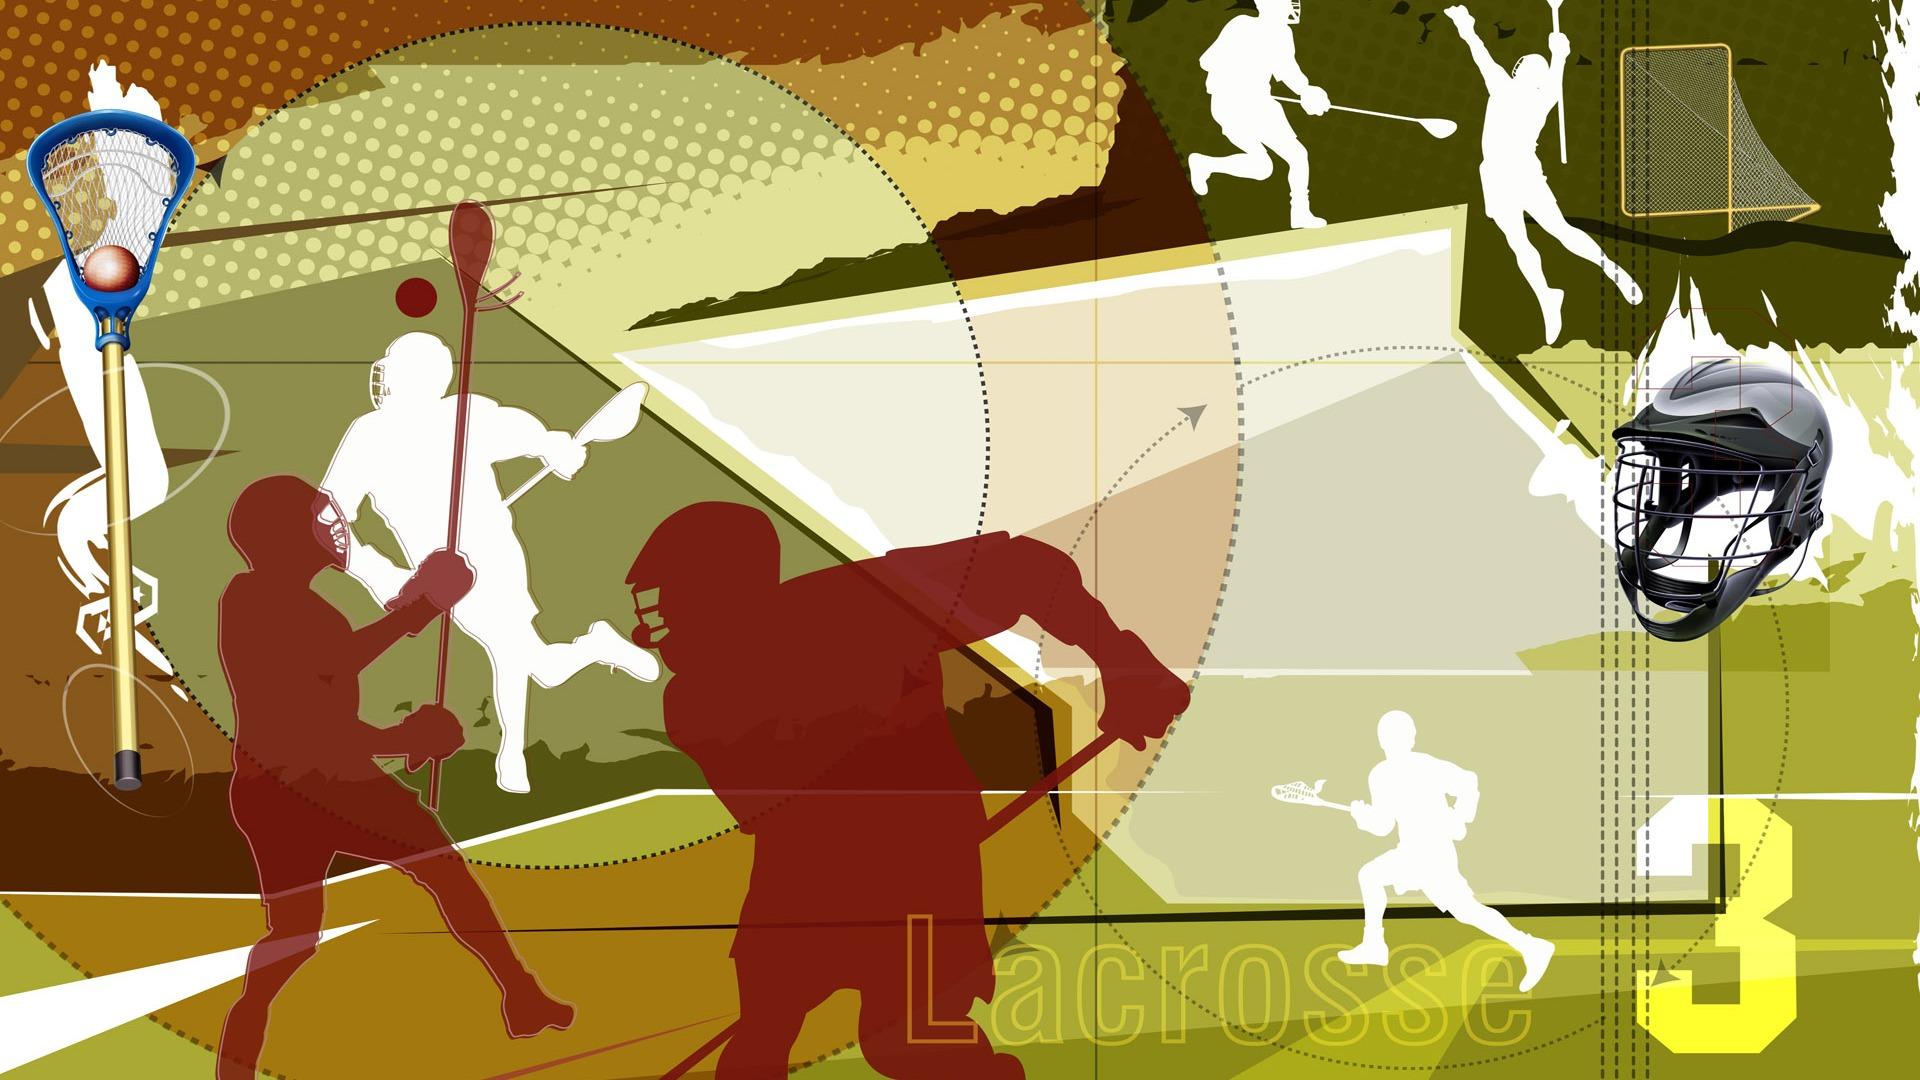 Fondo Con Iconos De Deporte: Pantalla Ancha De Fondos De Escritorio De Deporte (1) #13